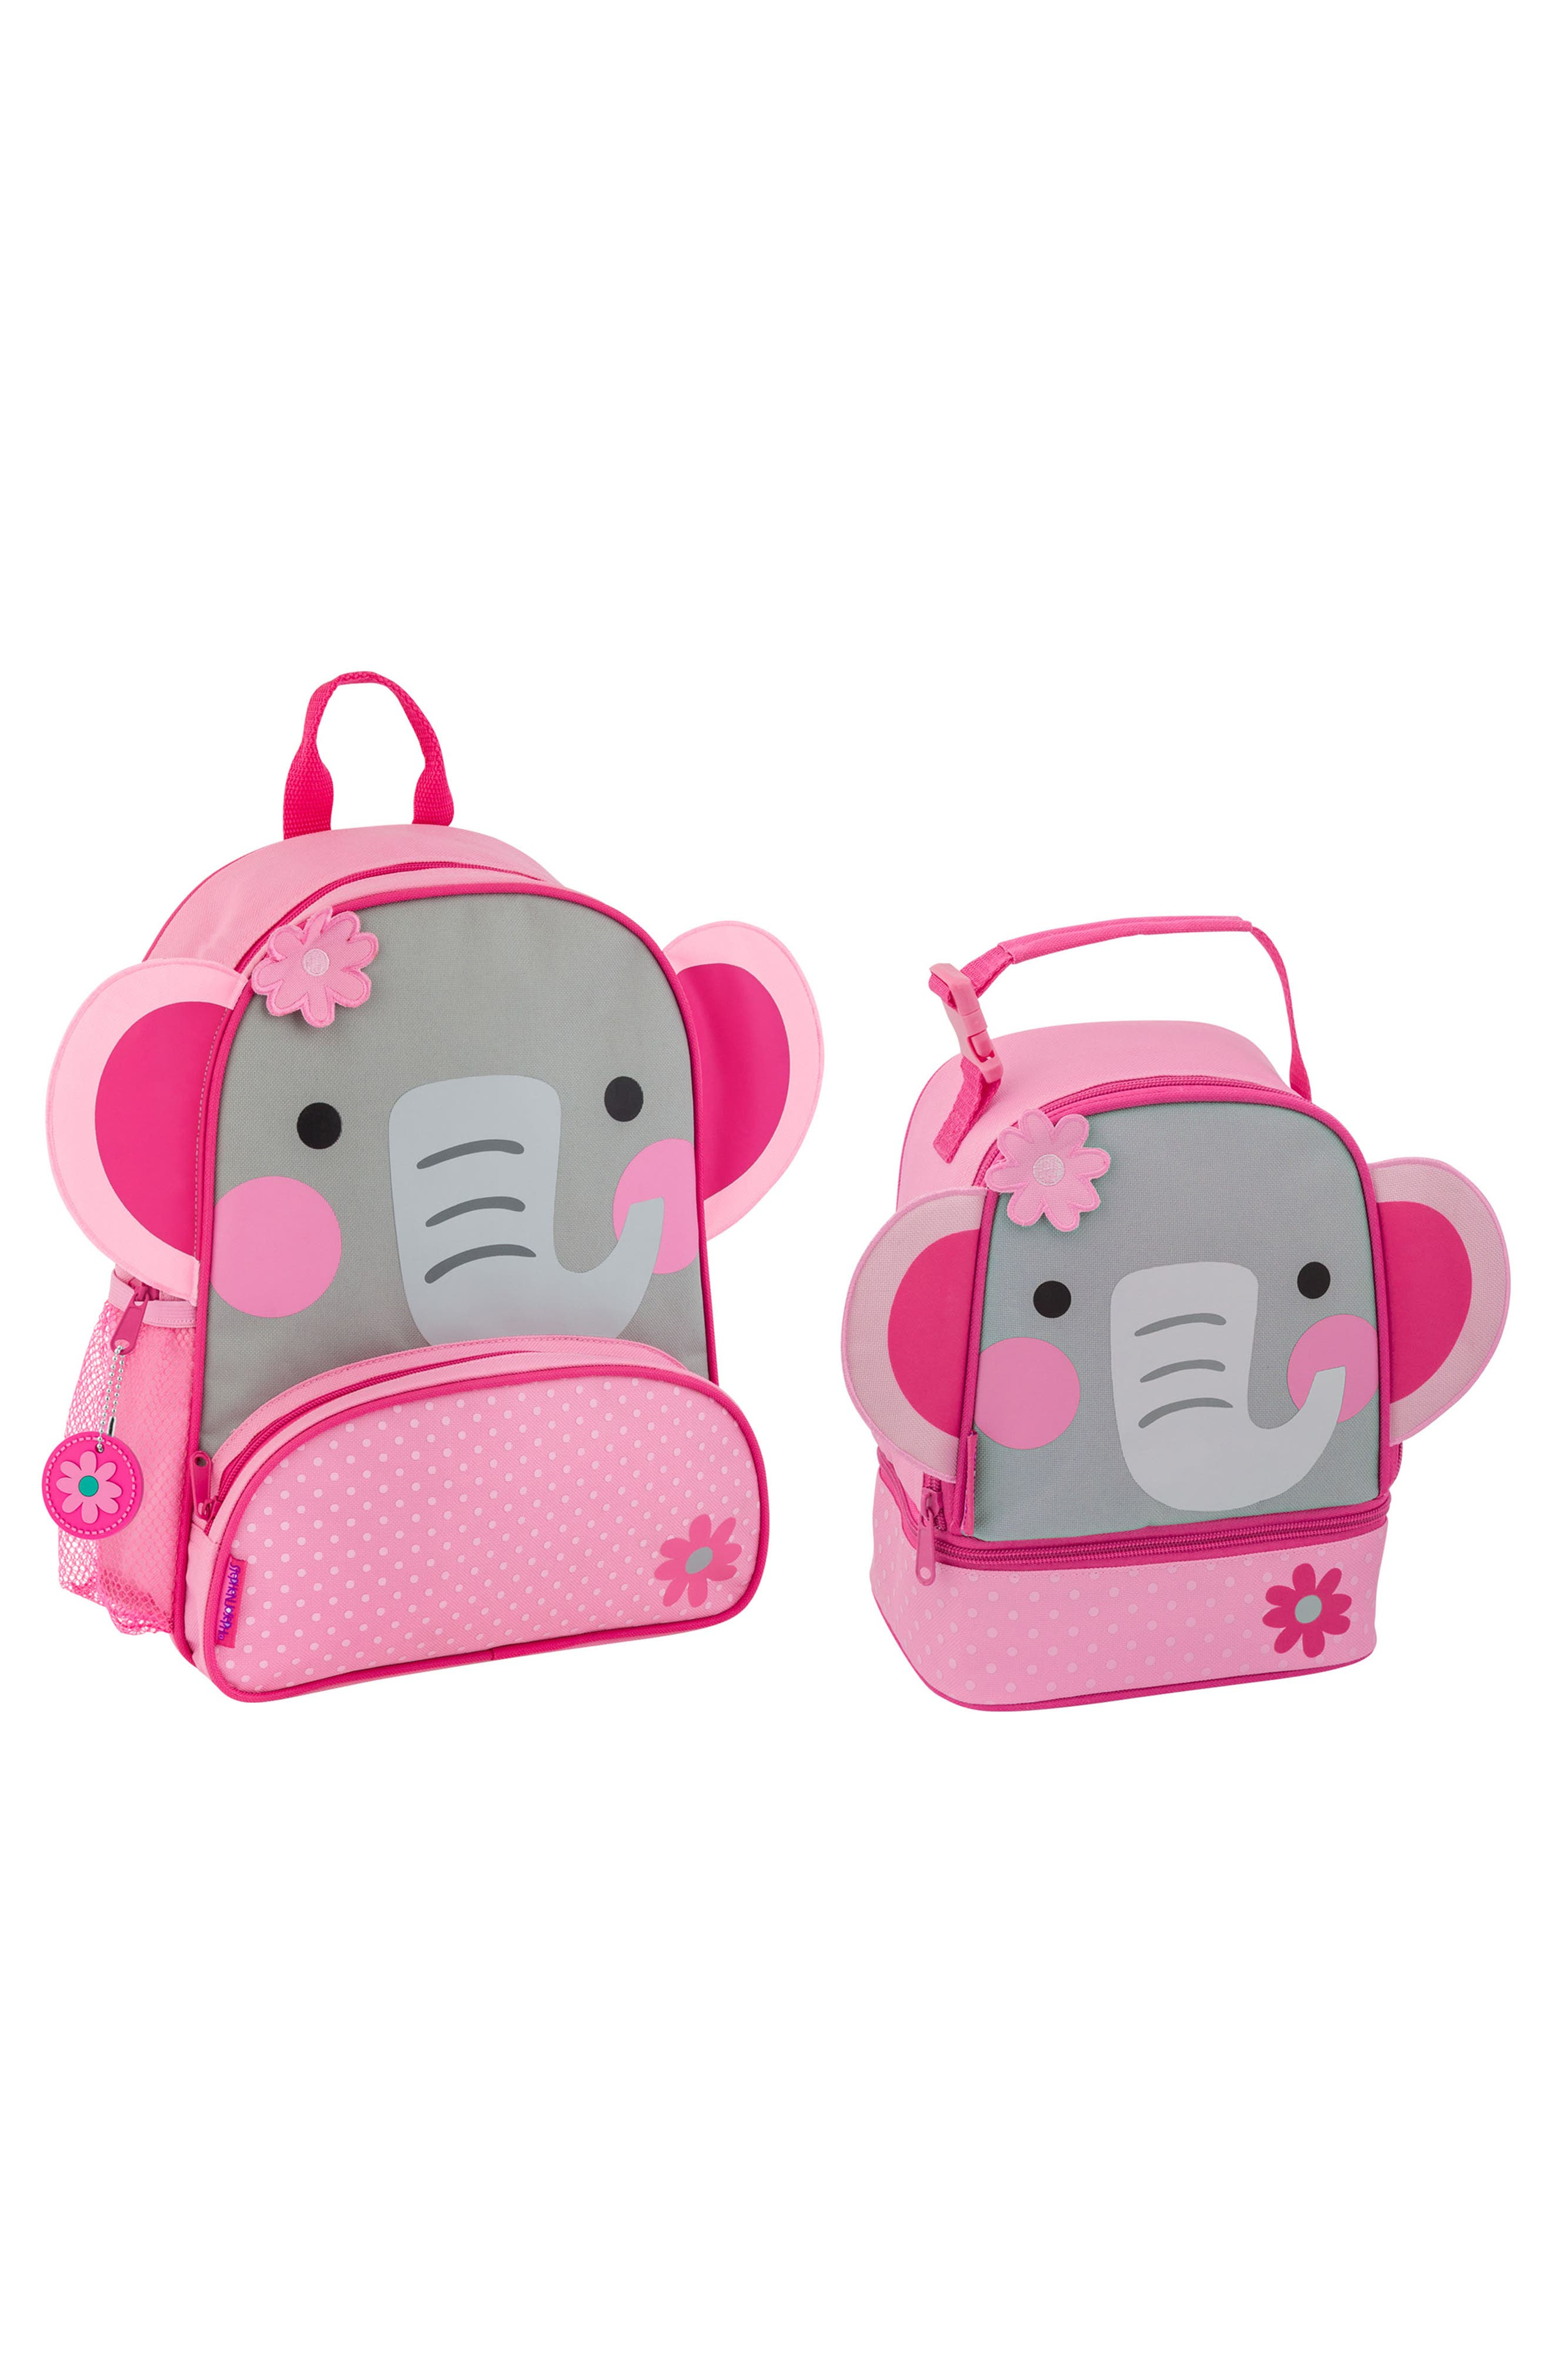 Girls Stephen Joseph Mermaid Sidekick Backpack  Lunch Pal  Pink